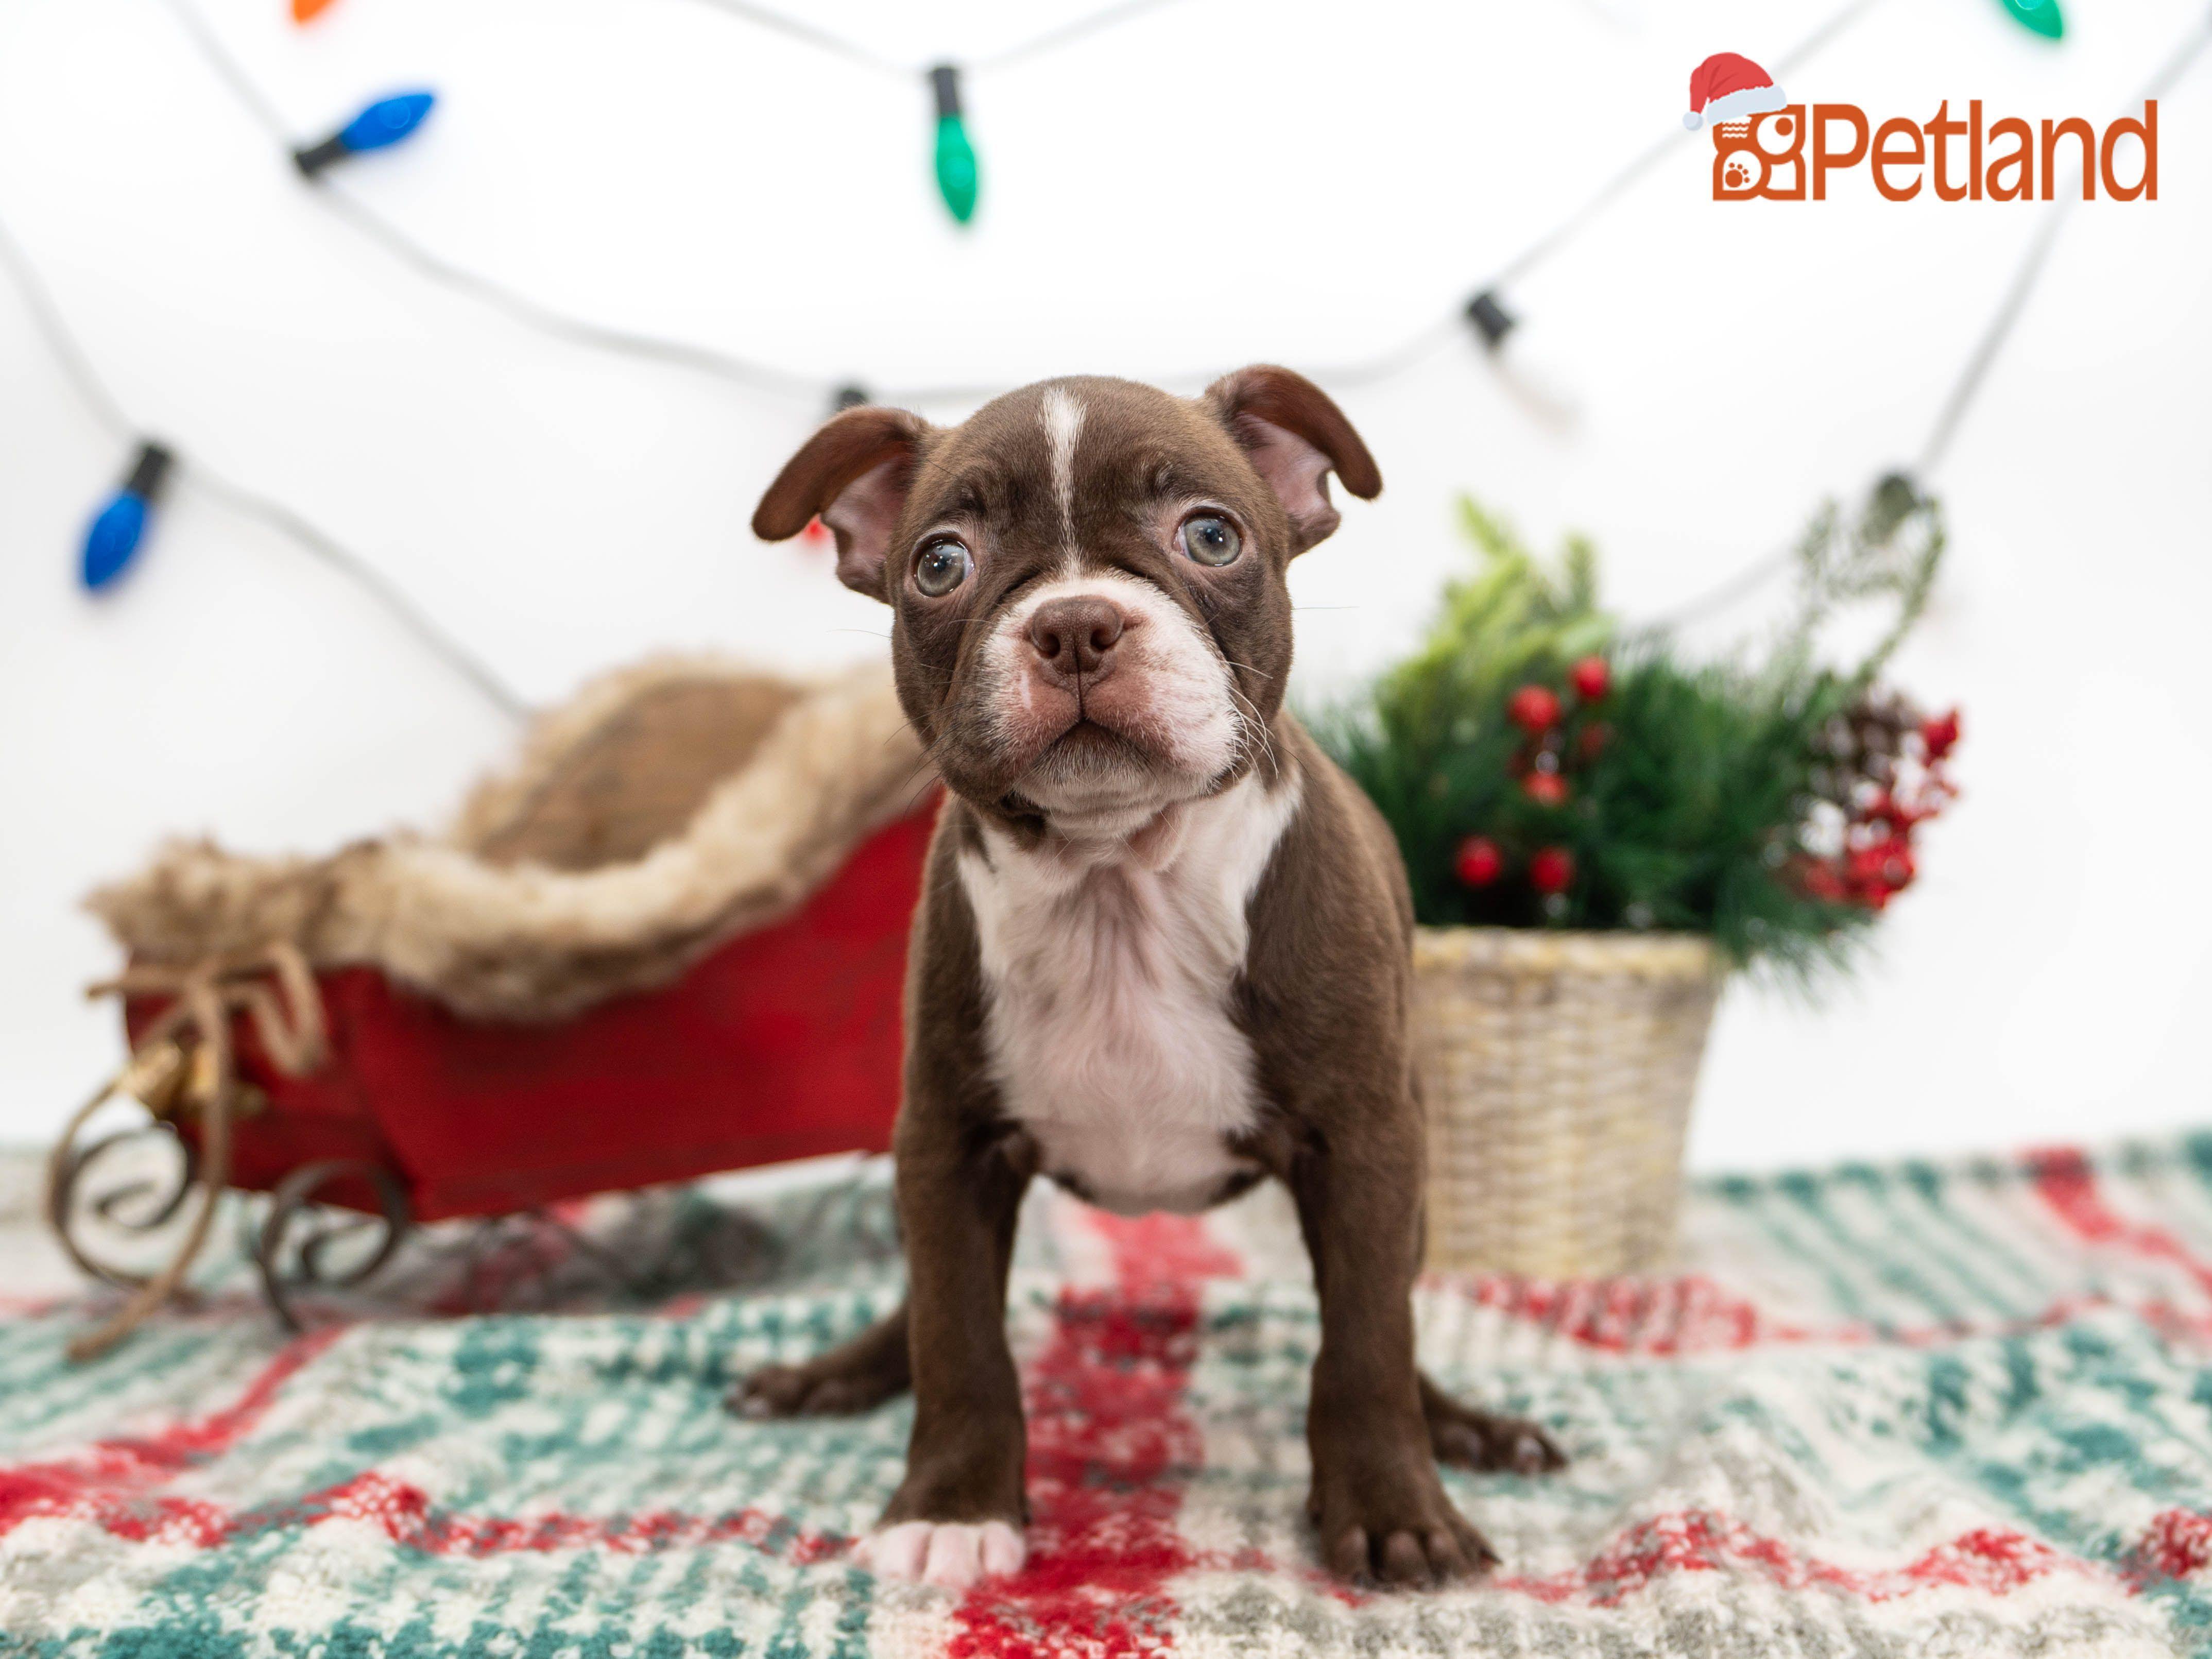 Puppies For Sale Puppy friends, Boston terrier puppy